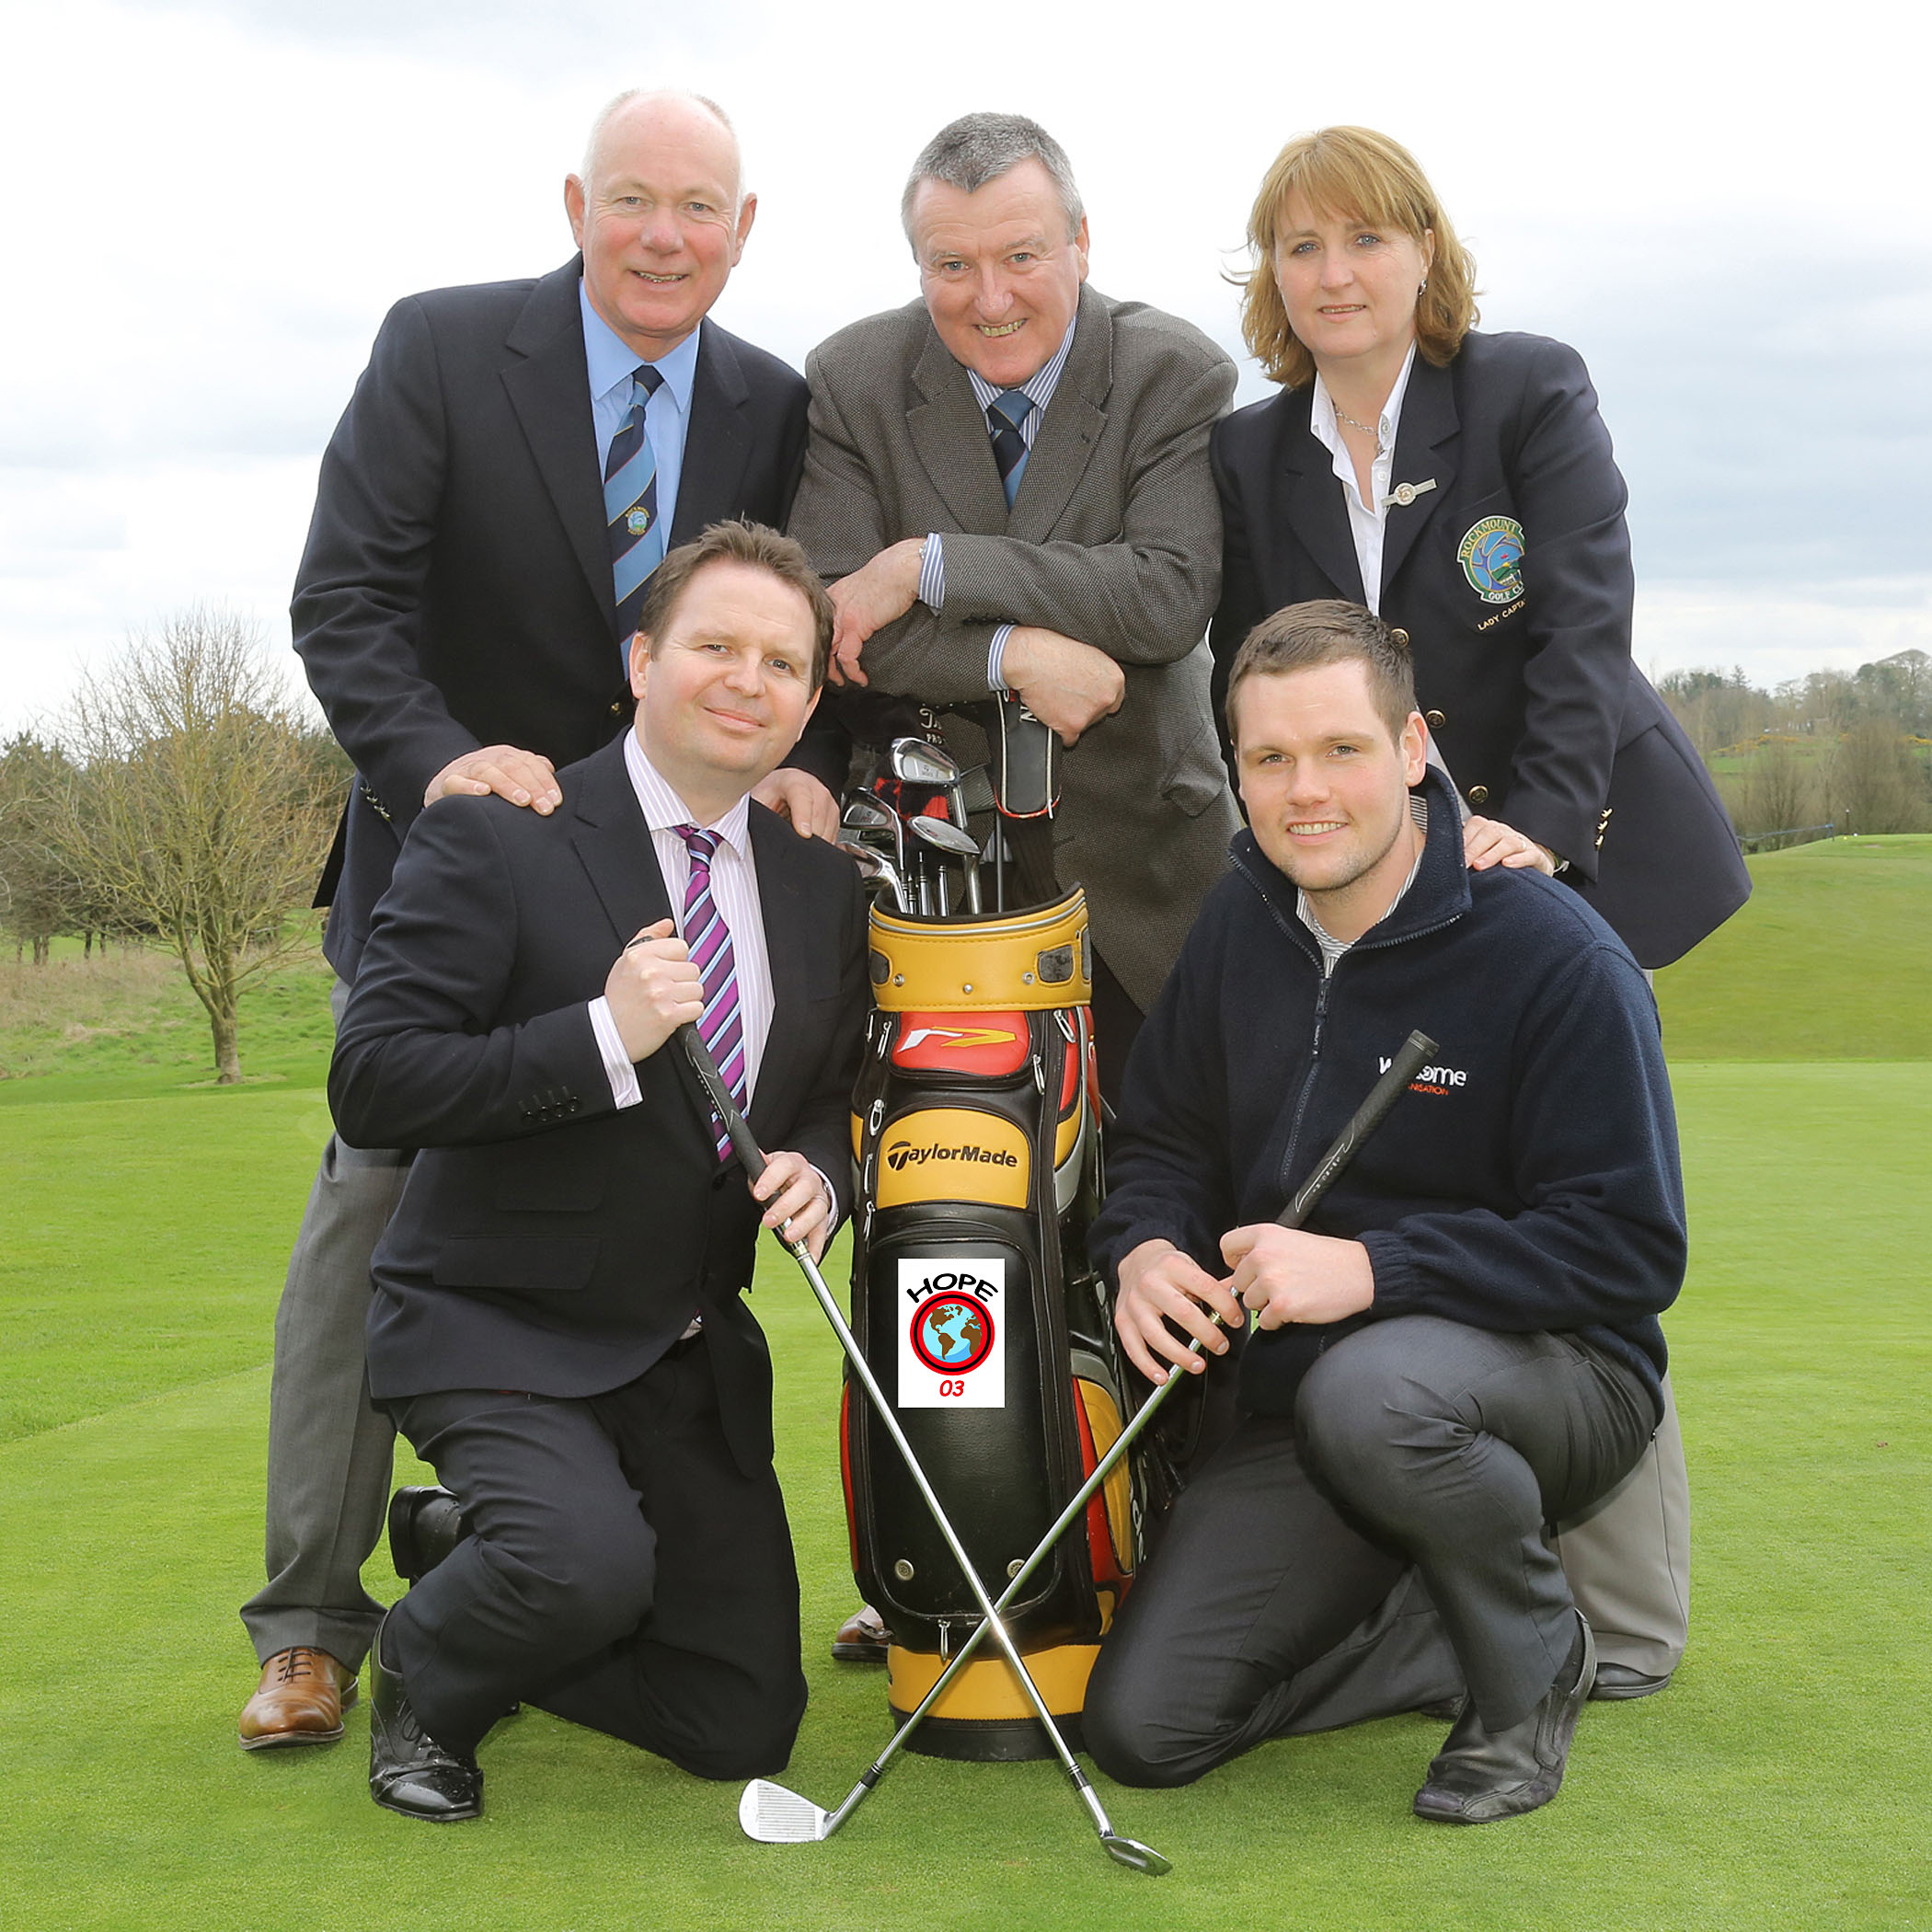 Golf: Pk's Golf Blog